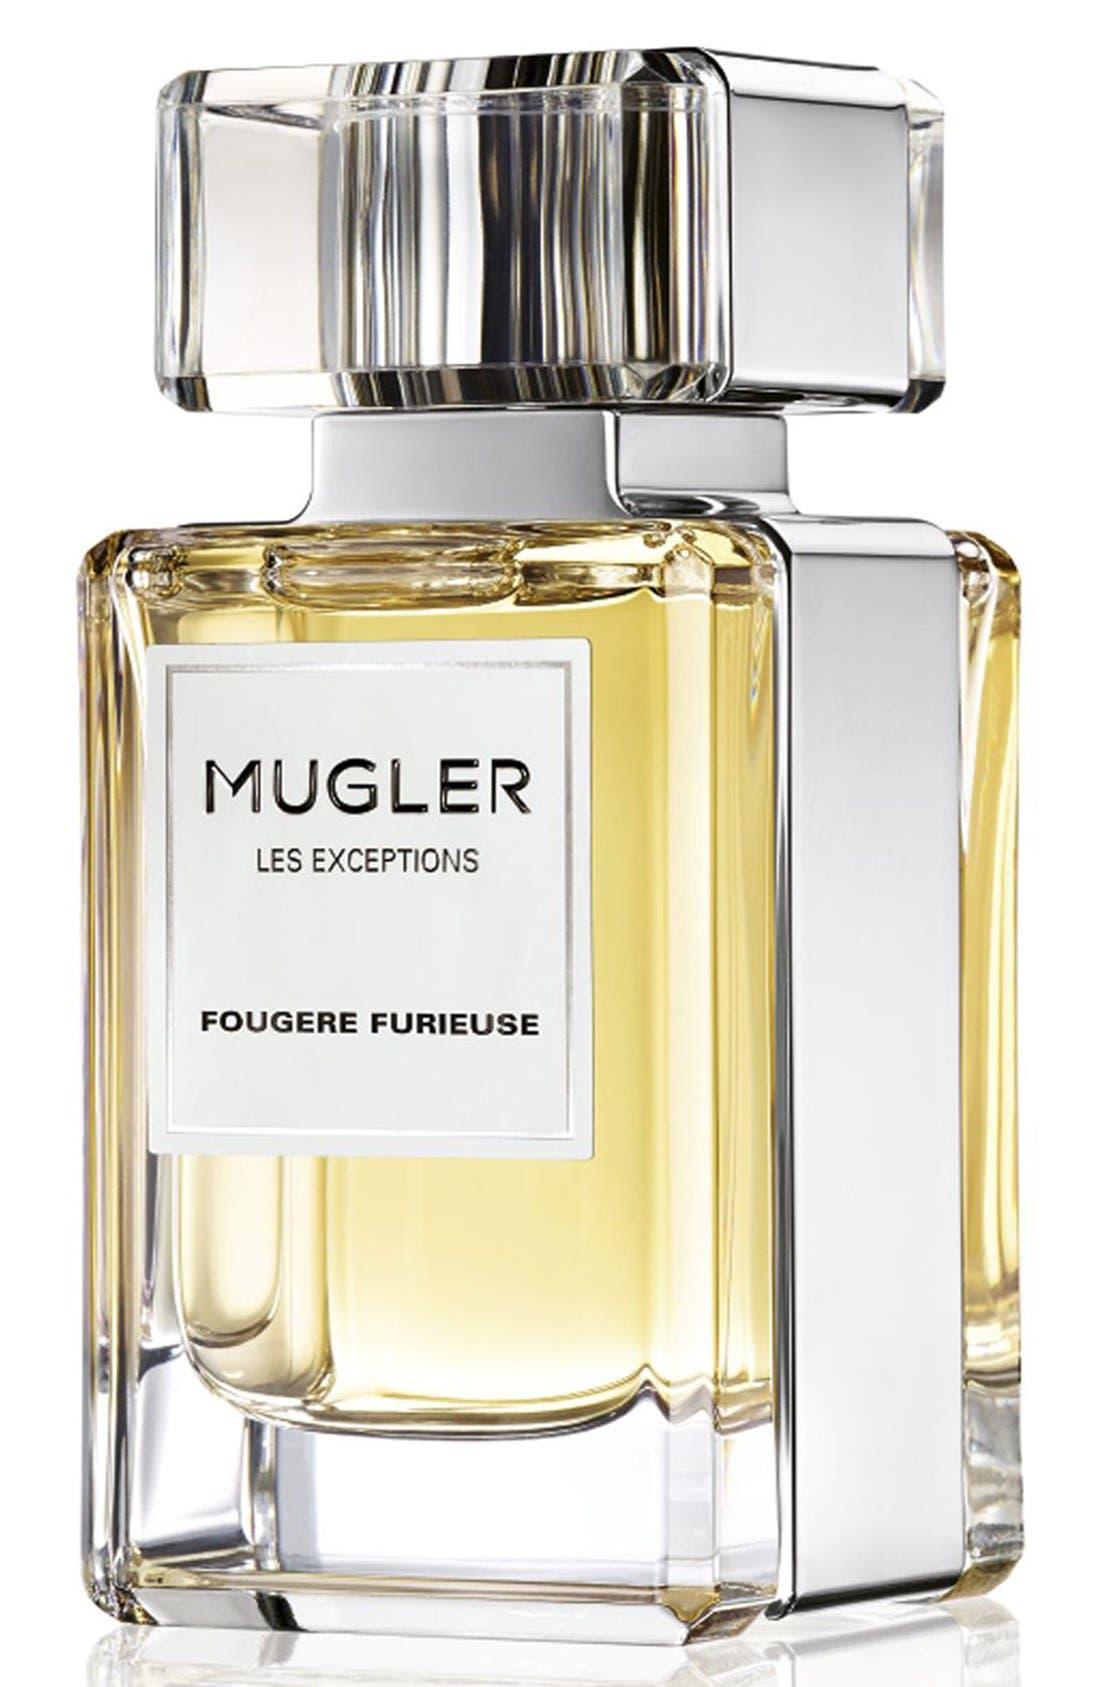 Mugler 'Les Exceptions - Fougère Furieuse' Fragrance